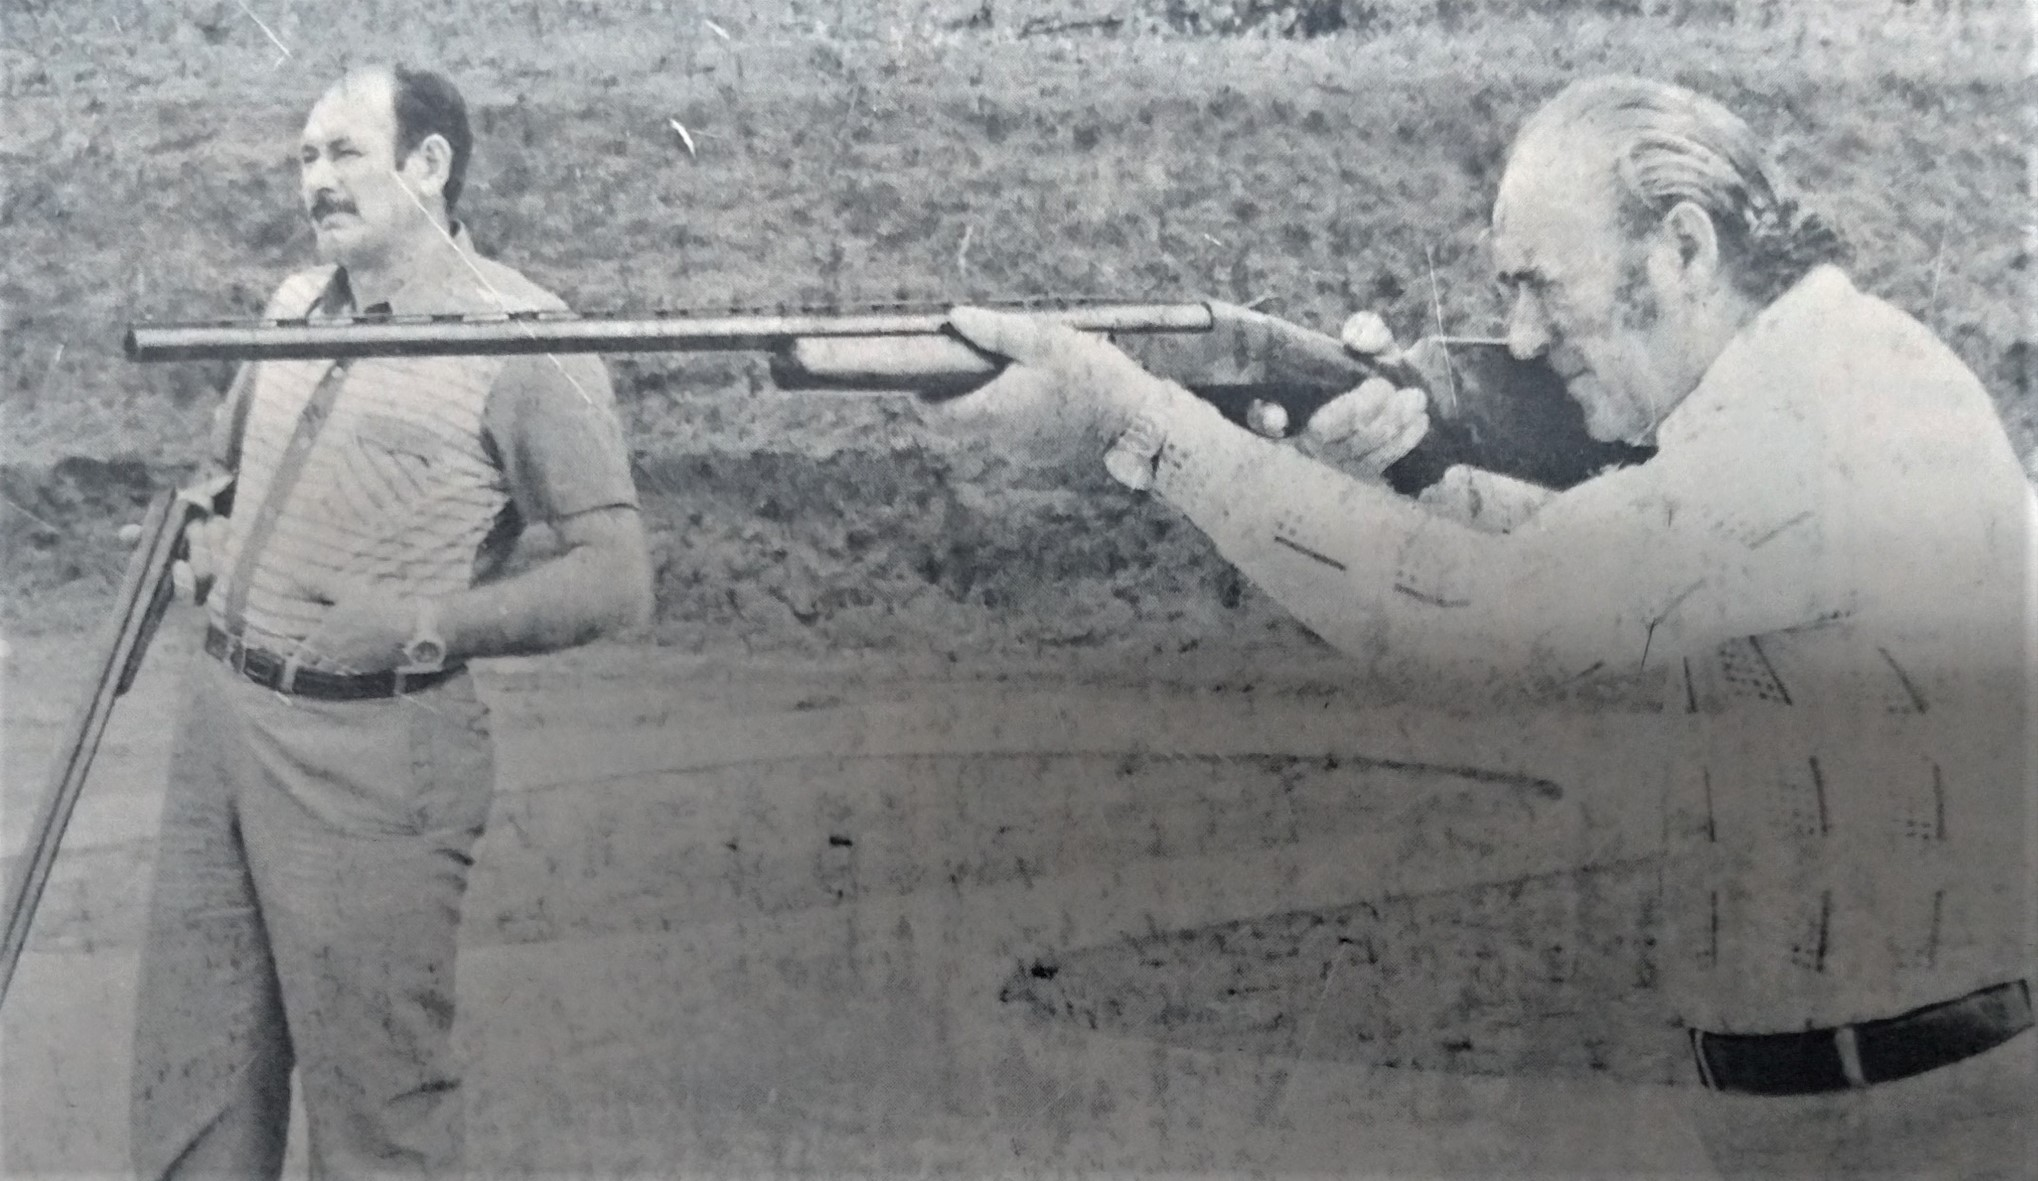 Campeonato de Tiro Aberto - 1978